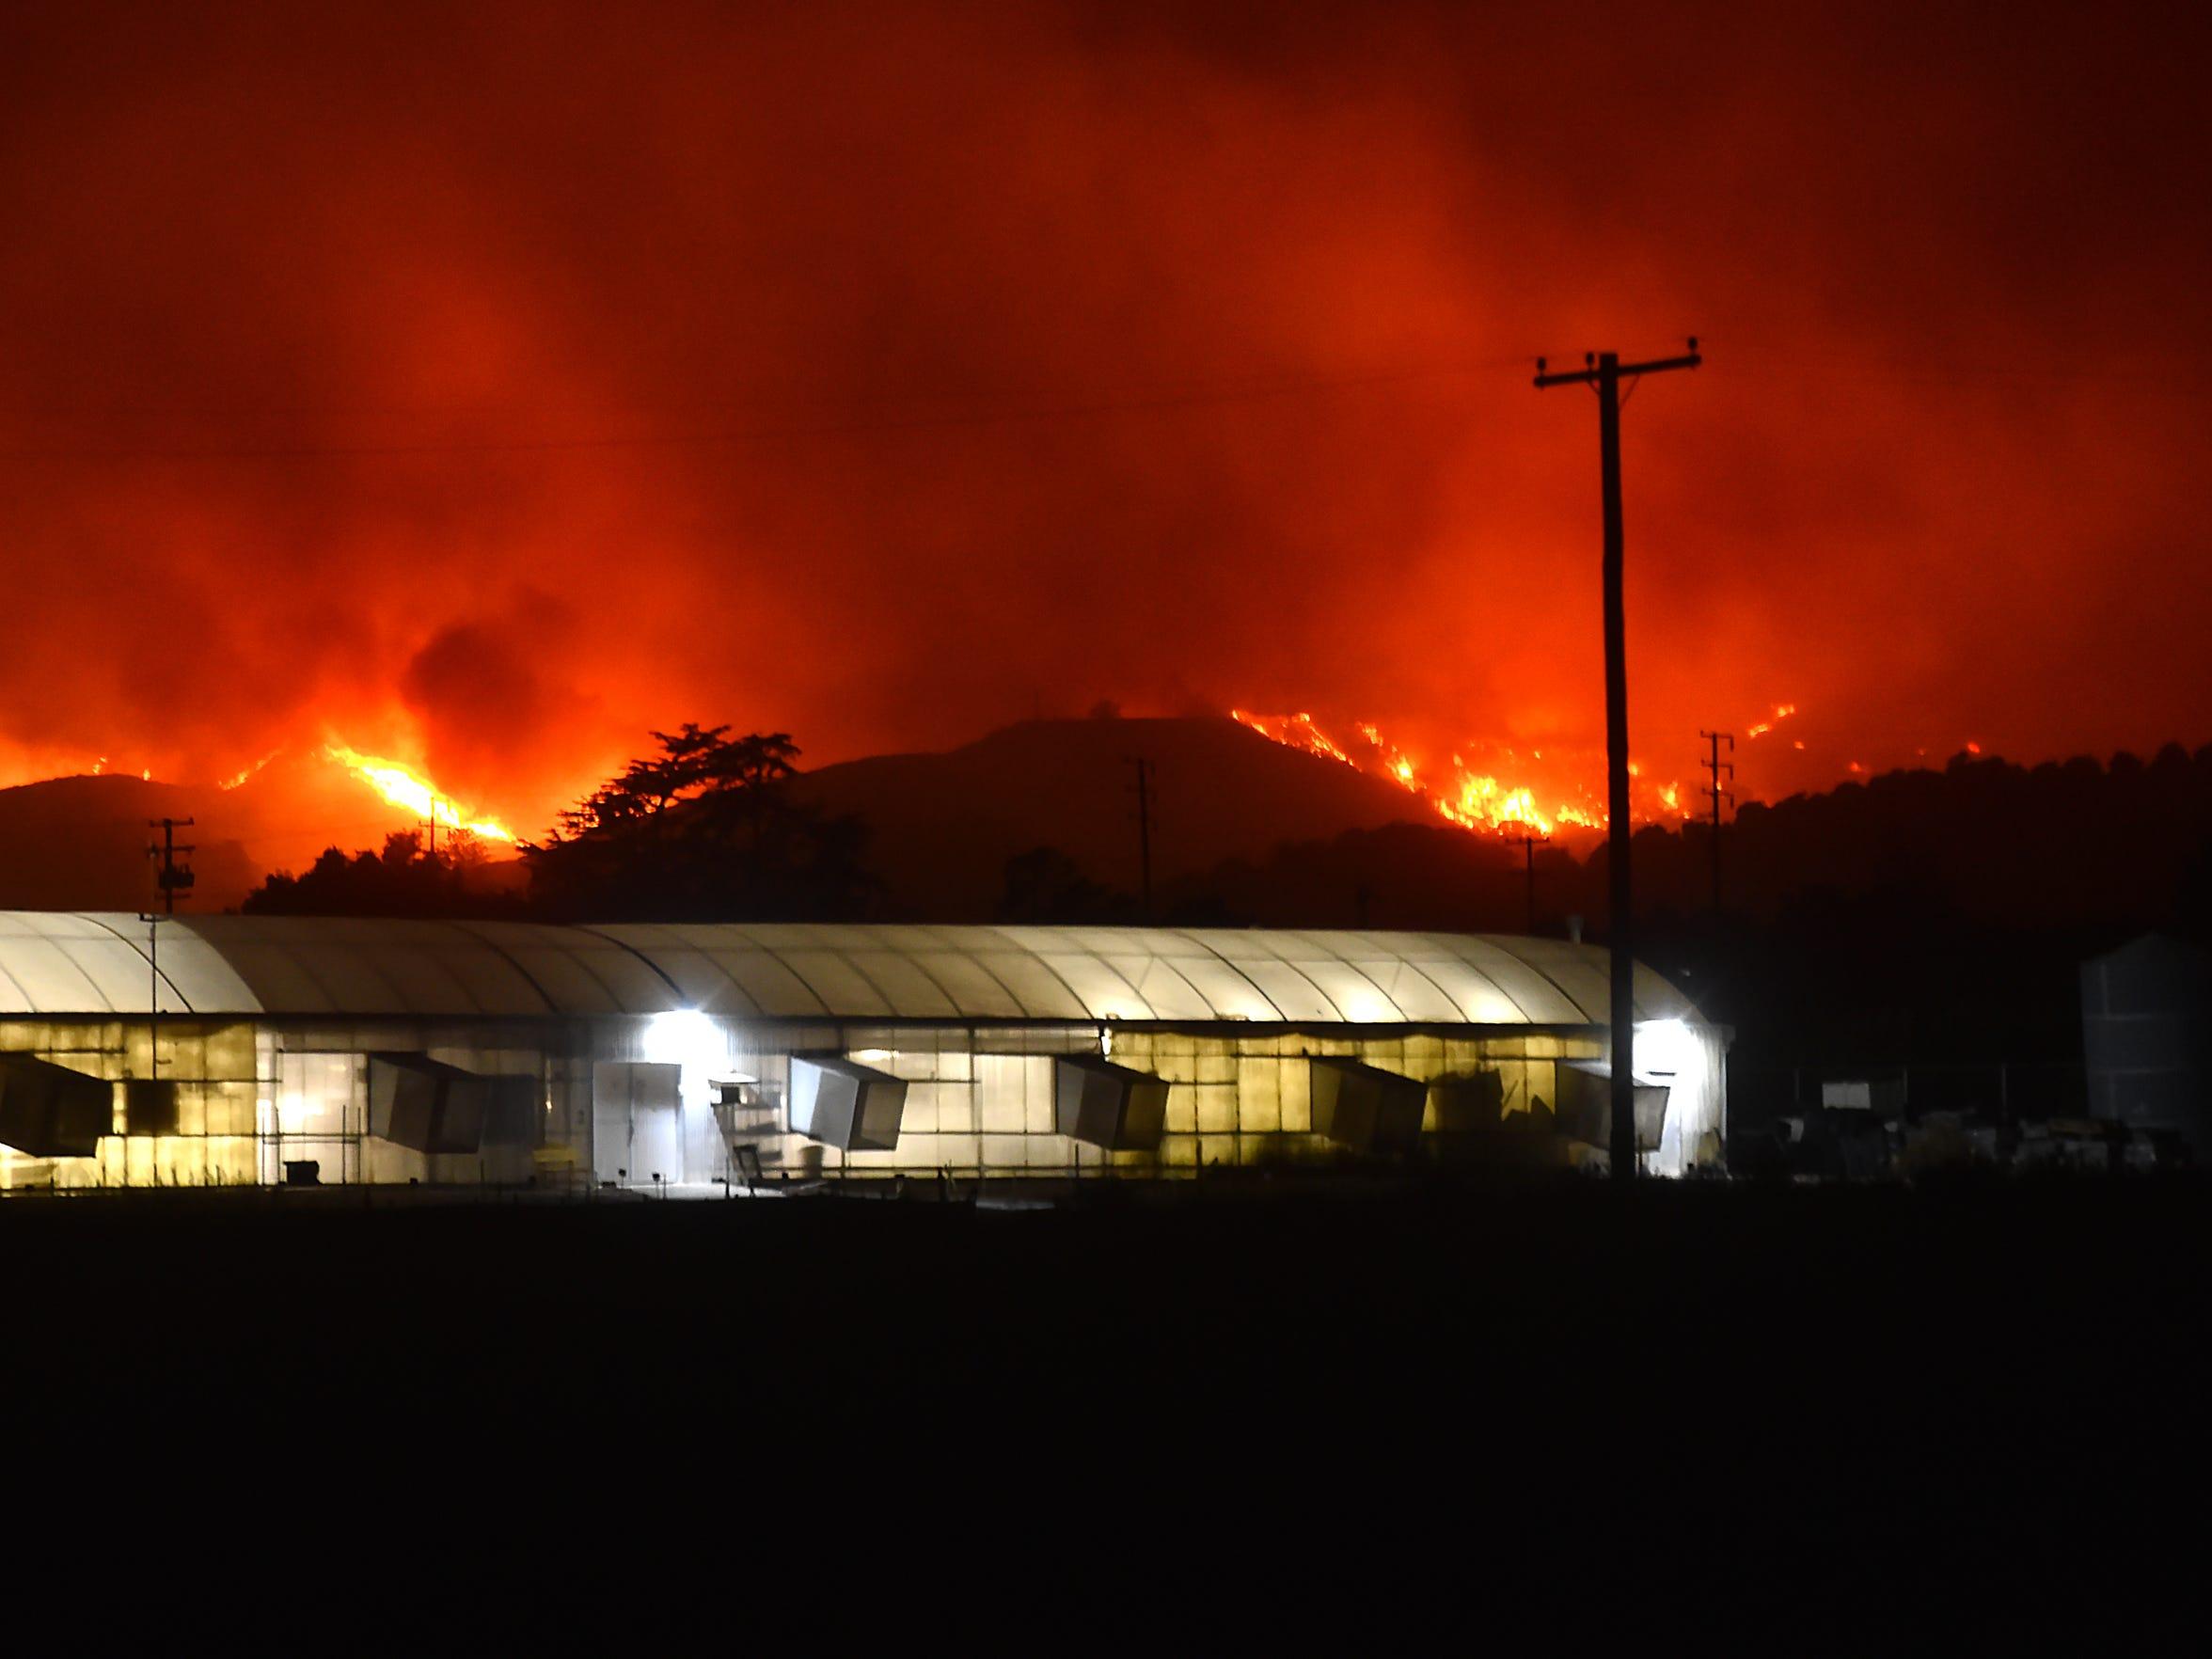 The Thomas Fire burns in the hills above Santa Paula on Dec. 4, 2017.